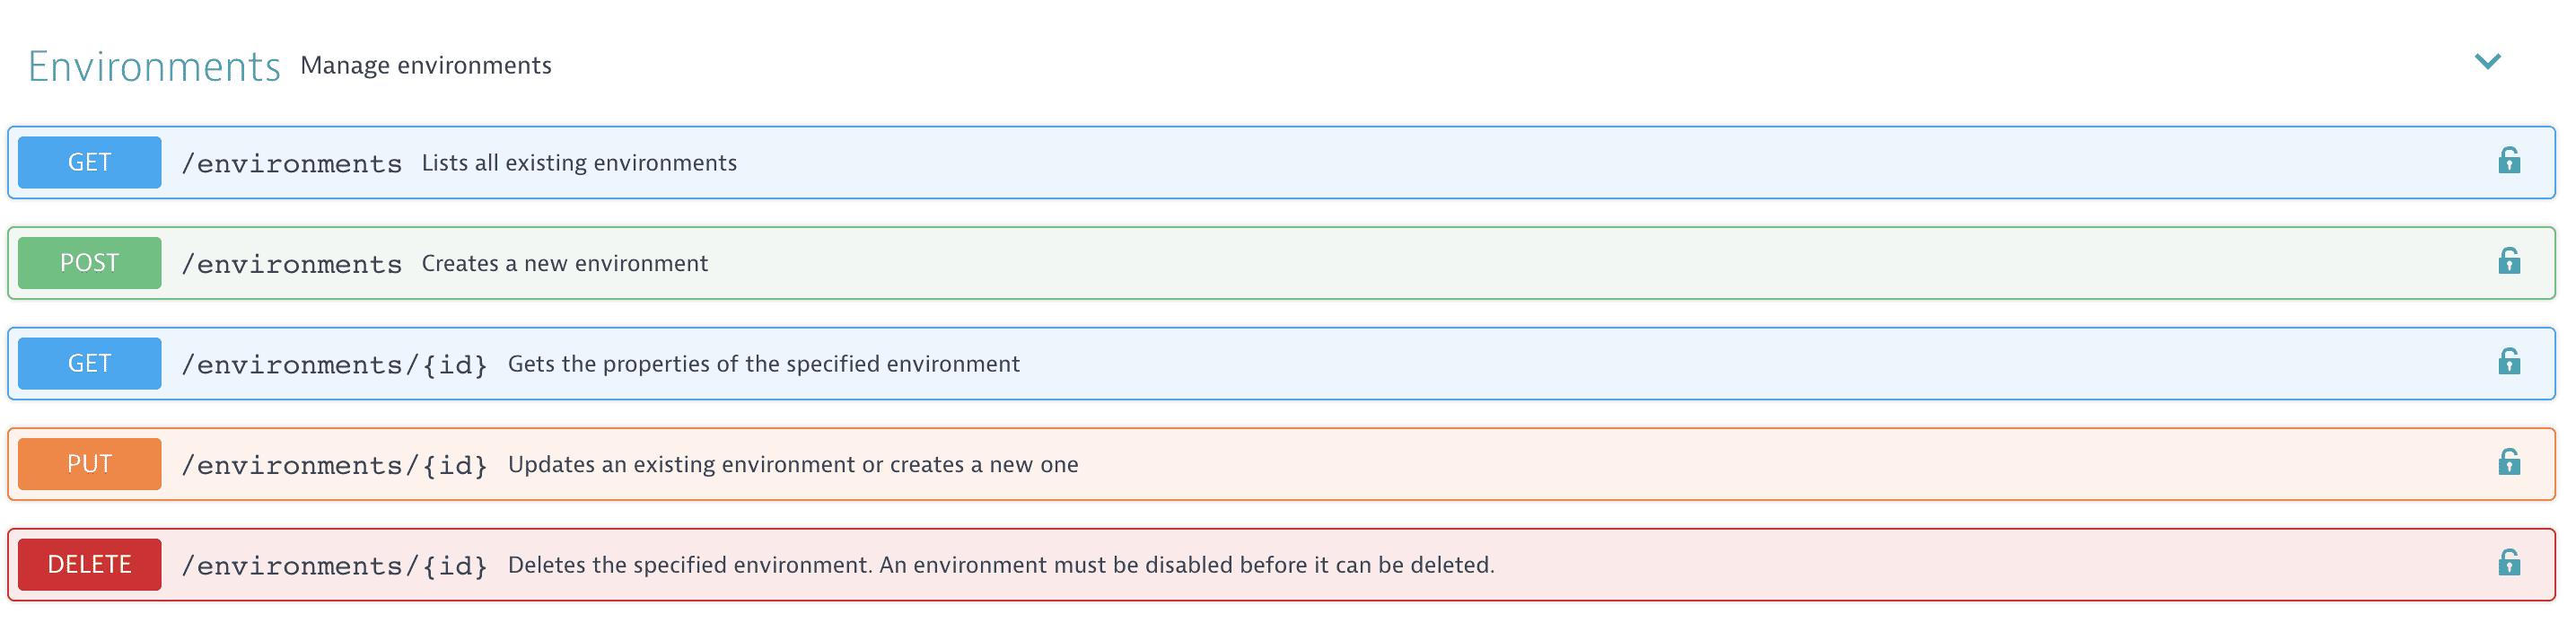 Environments REST API